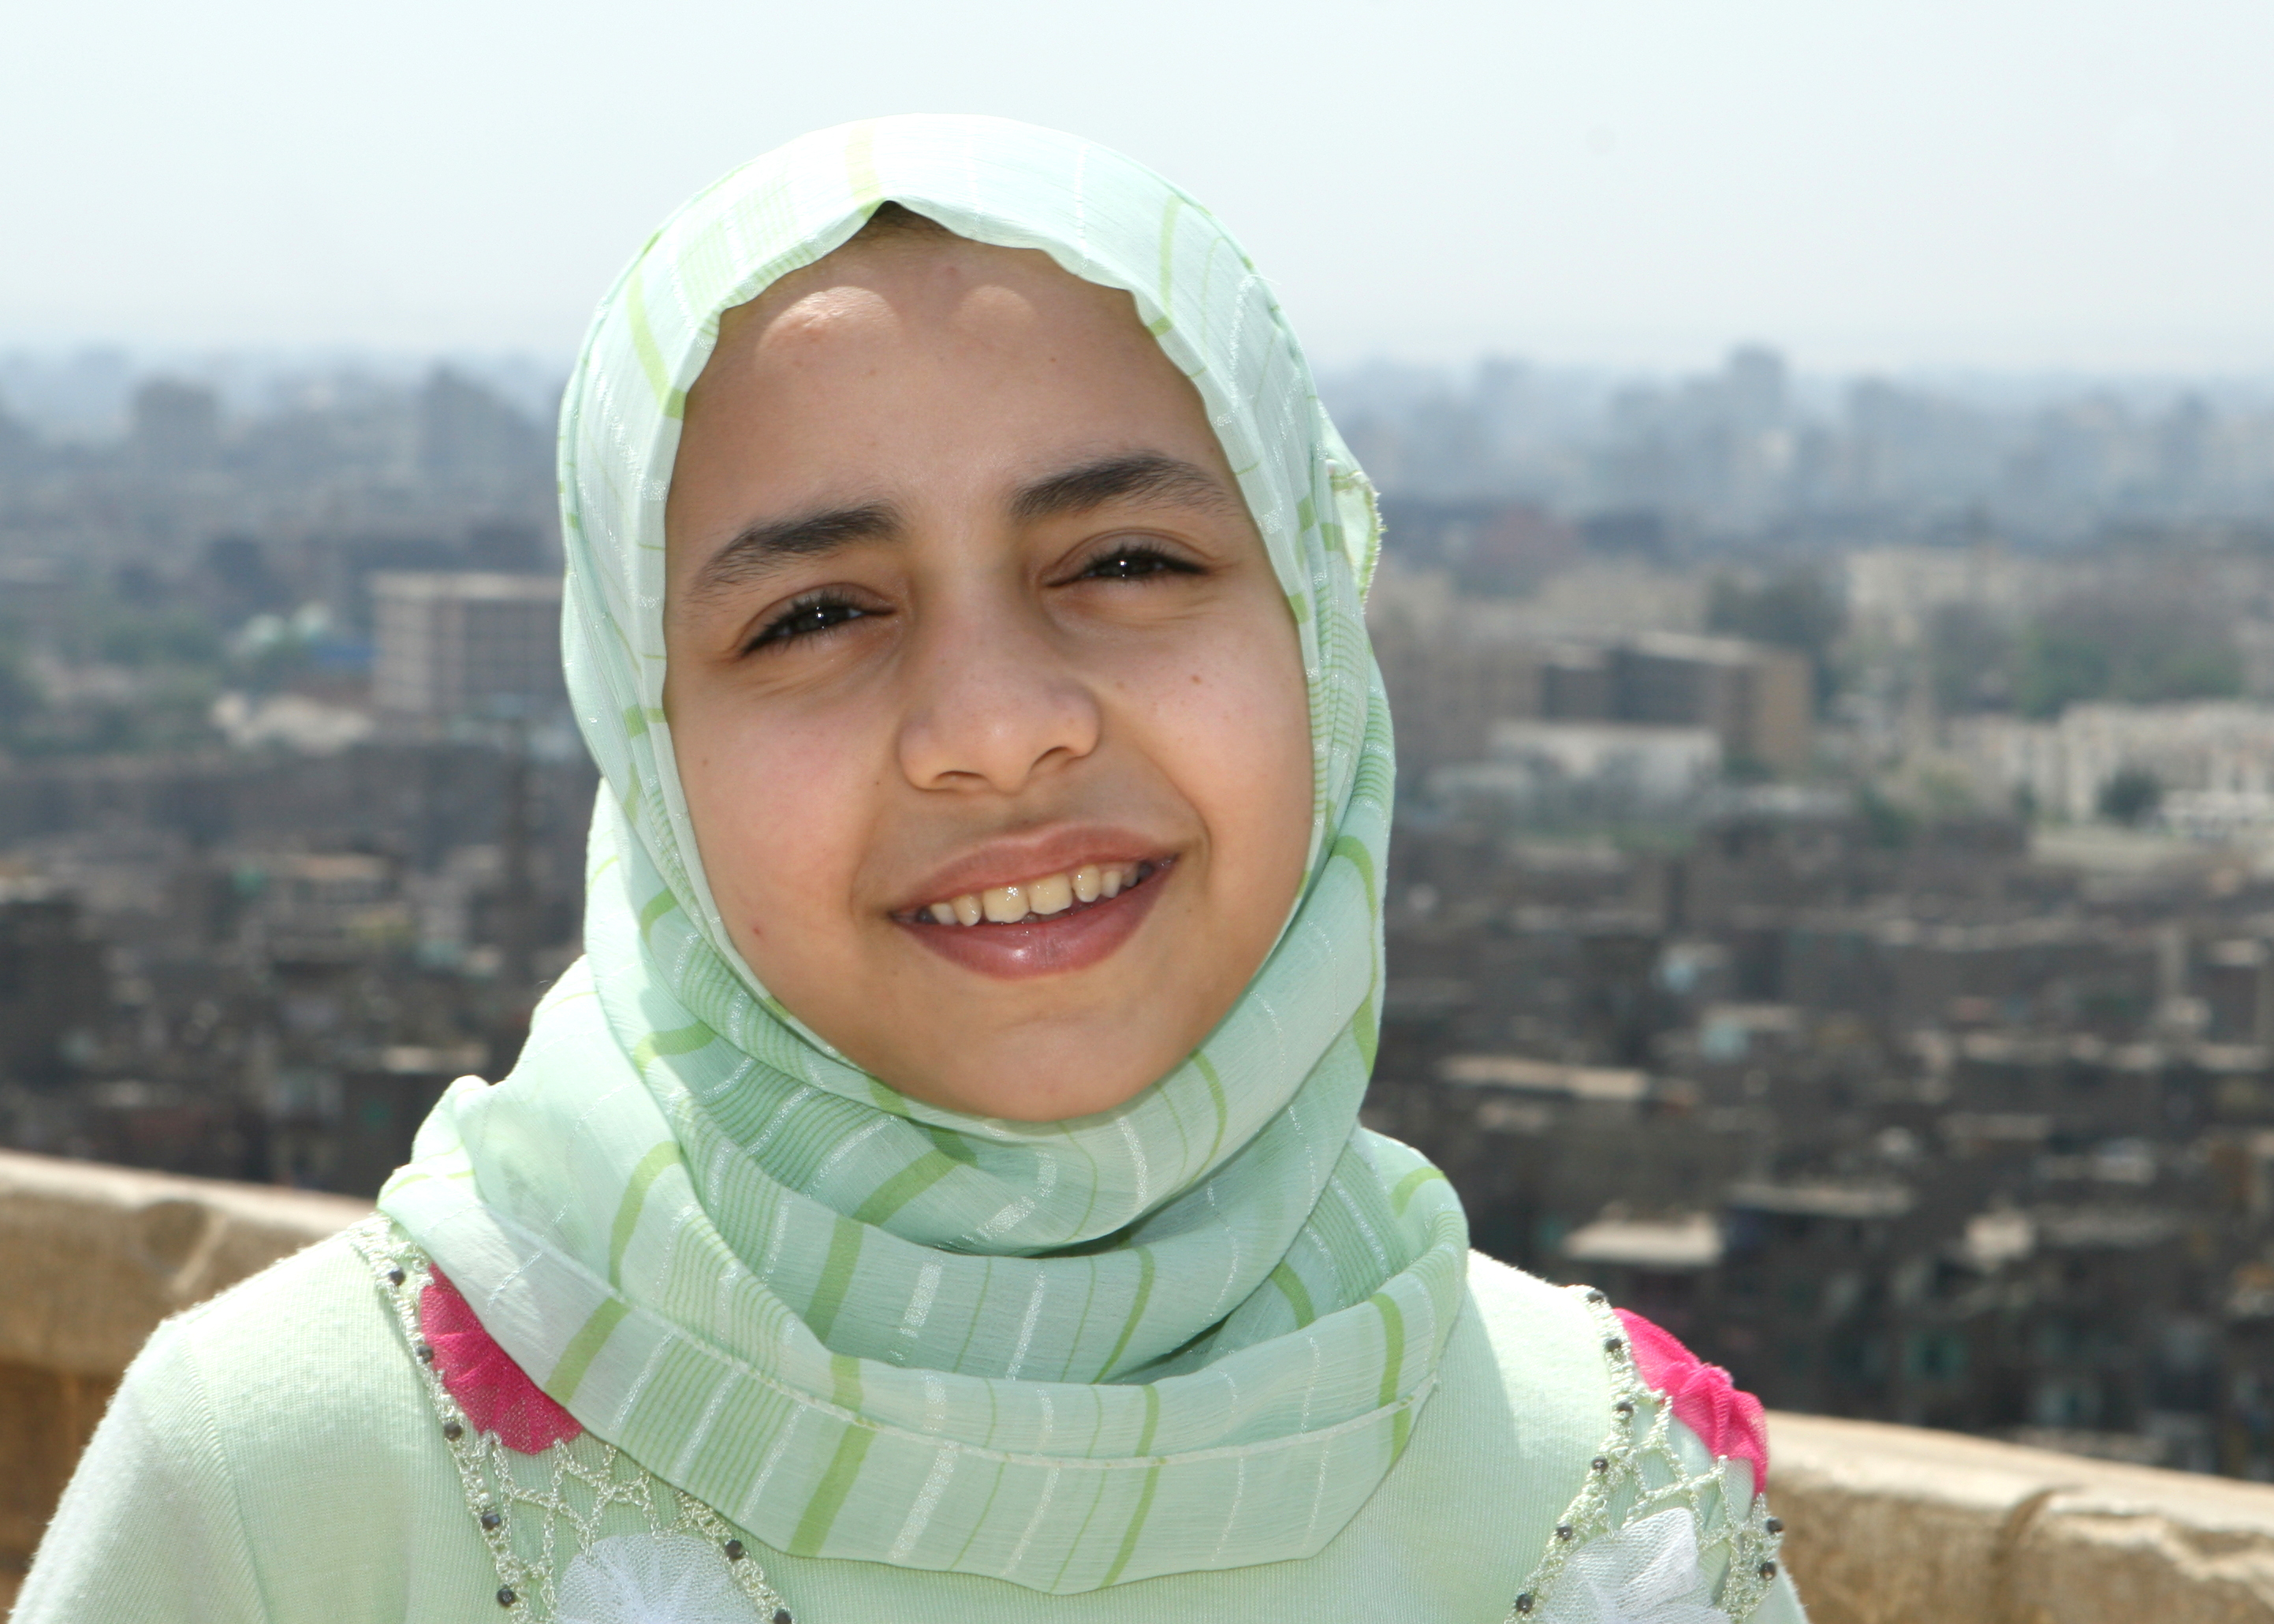 593e22f0f7 File Flickr - DavidDennisPhotos.com - Girl at Mohamed Ali Mosque  overlooking Cairo.jpg